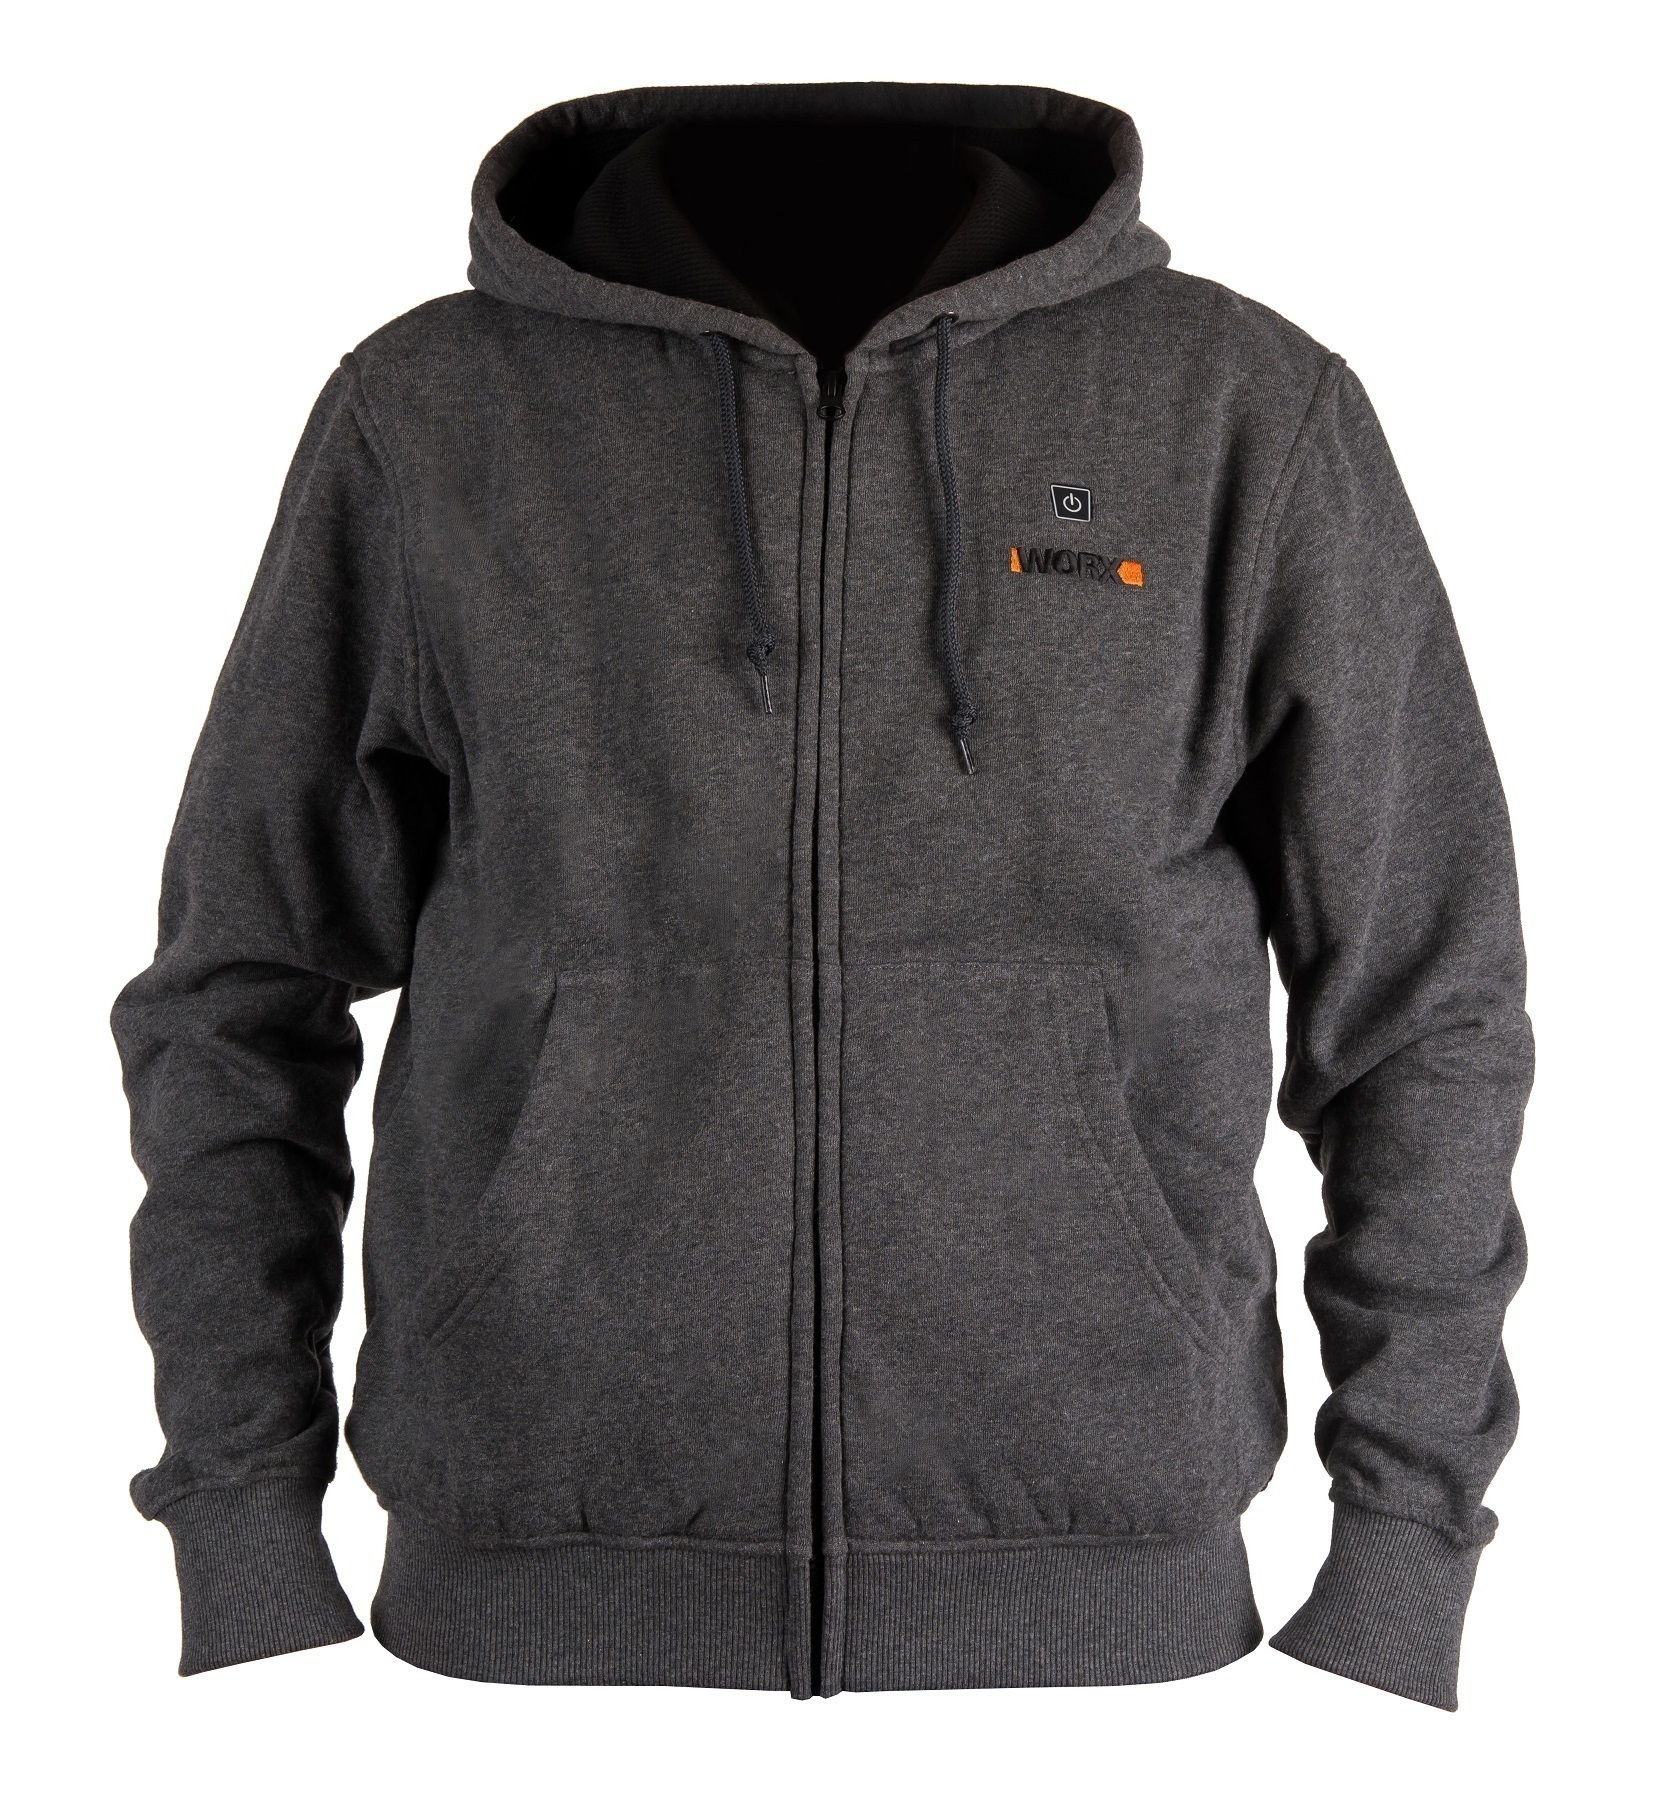 Куртка с подогревом Worx WA4660 2XL темно-серая